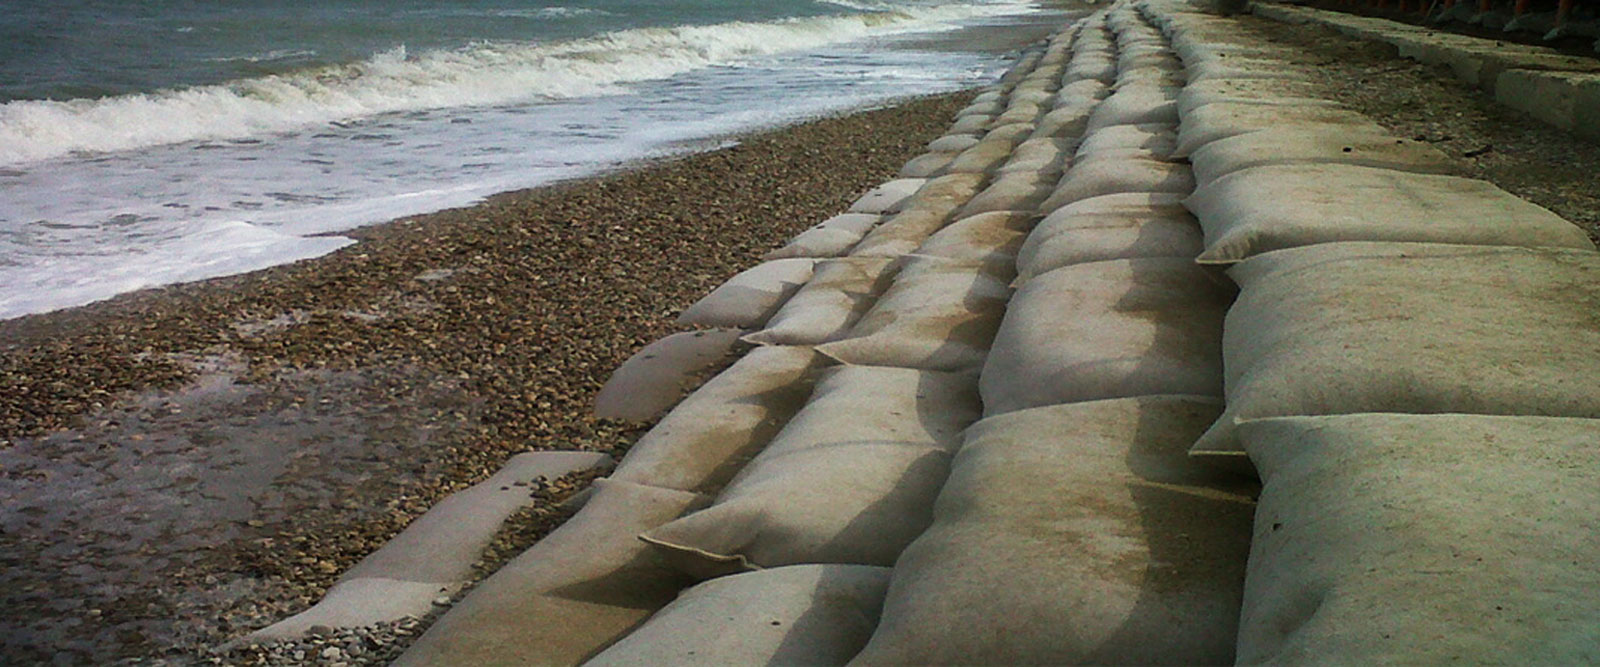 WAVEPLUS sea erosion control sand bags